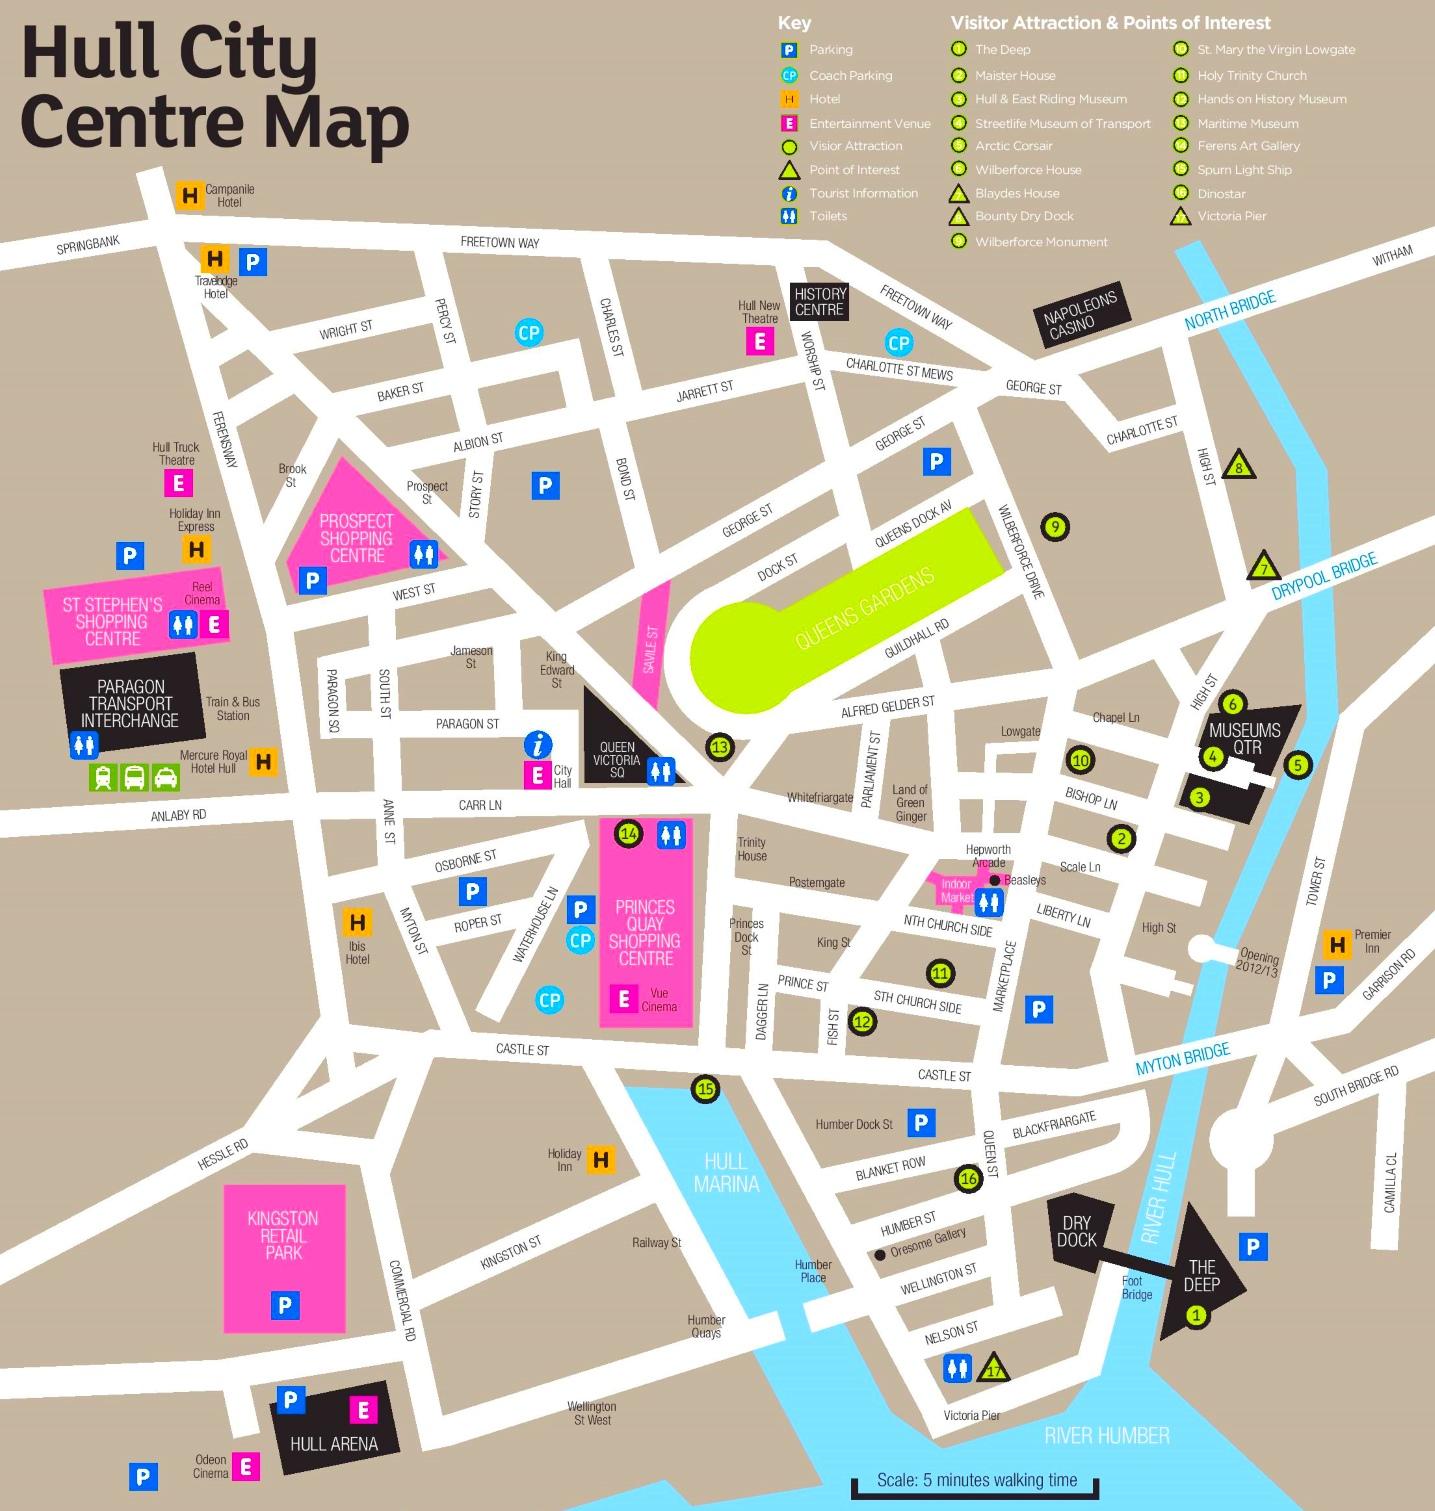 Hull sightseeing map